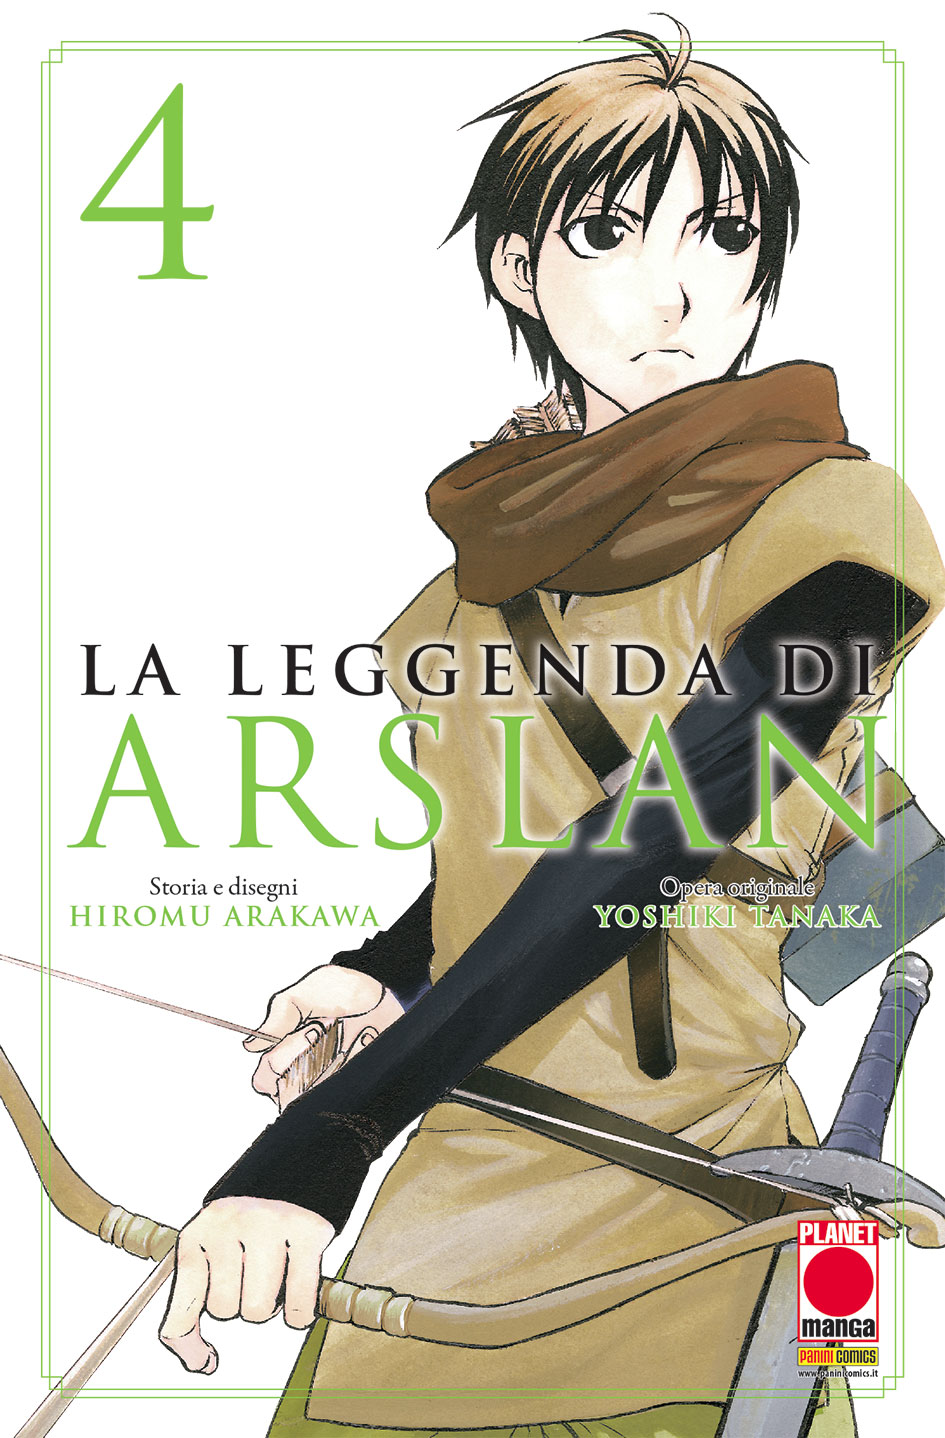 Più riguardo a La leggenda di Arslan vol. 4